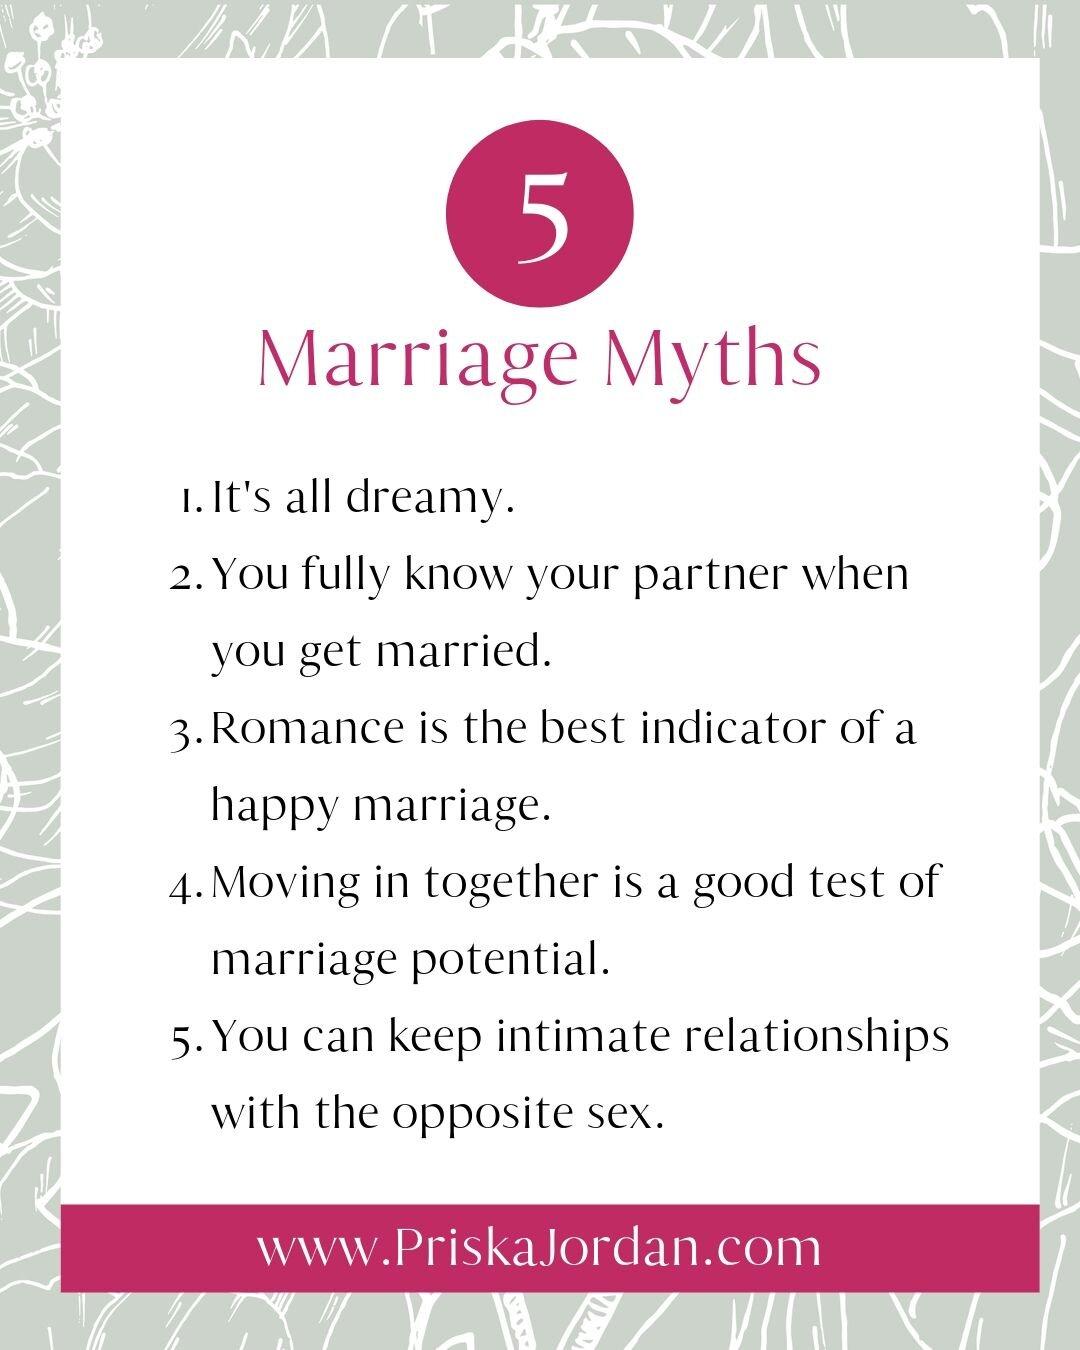 5 Marriage Myths.jpg